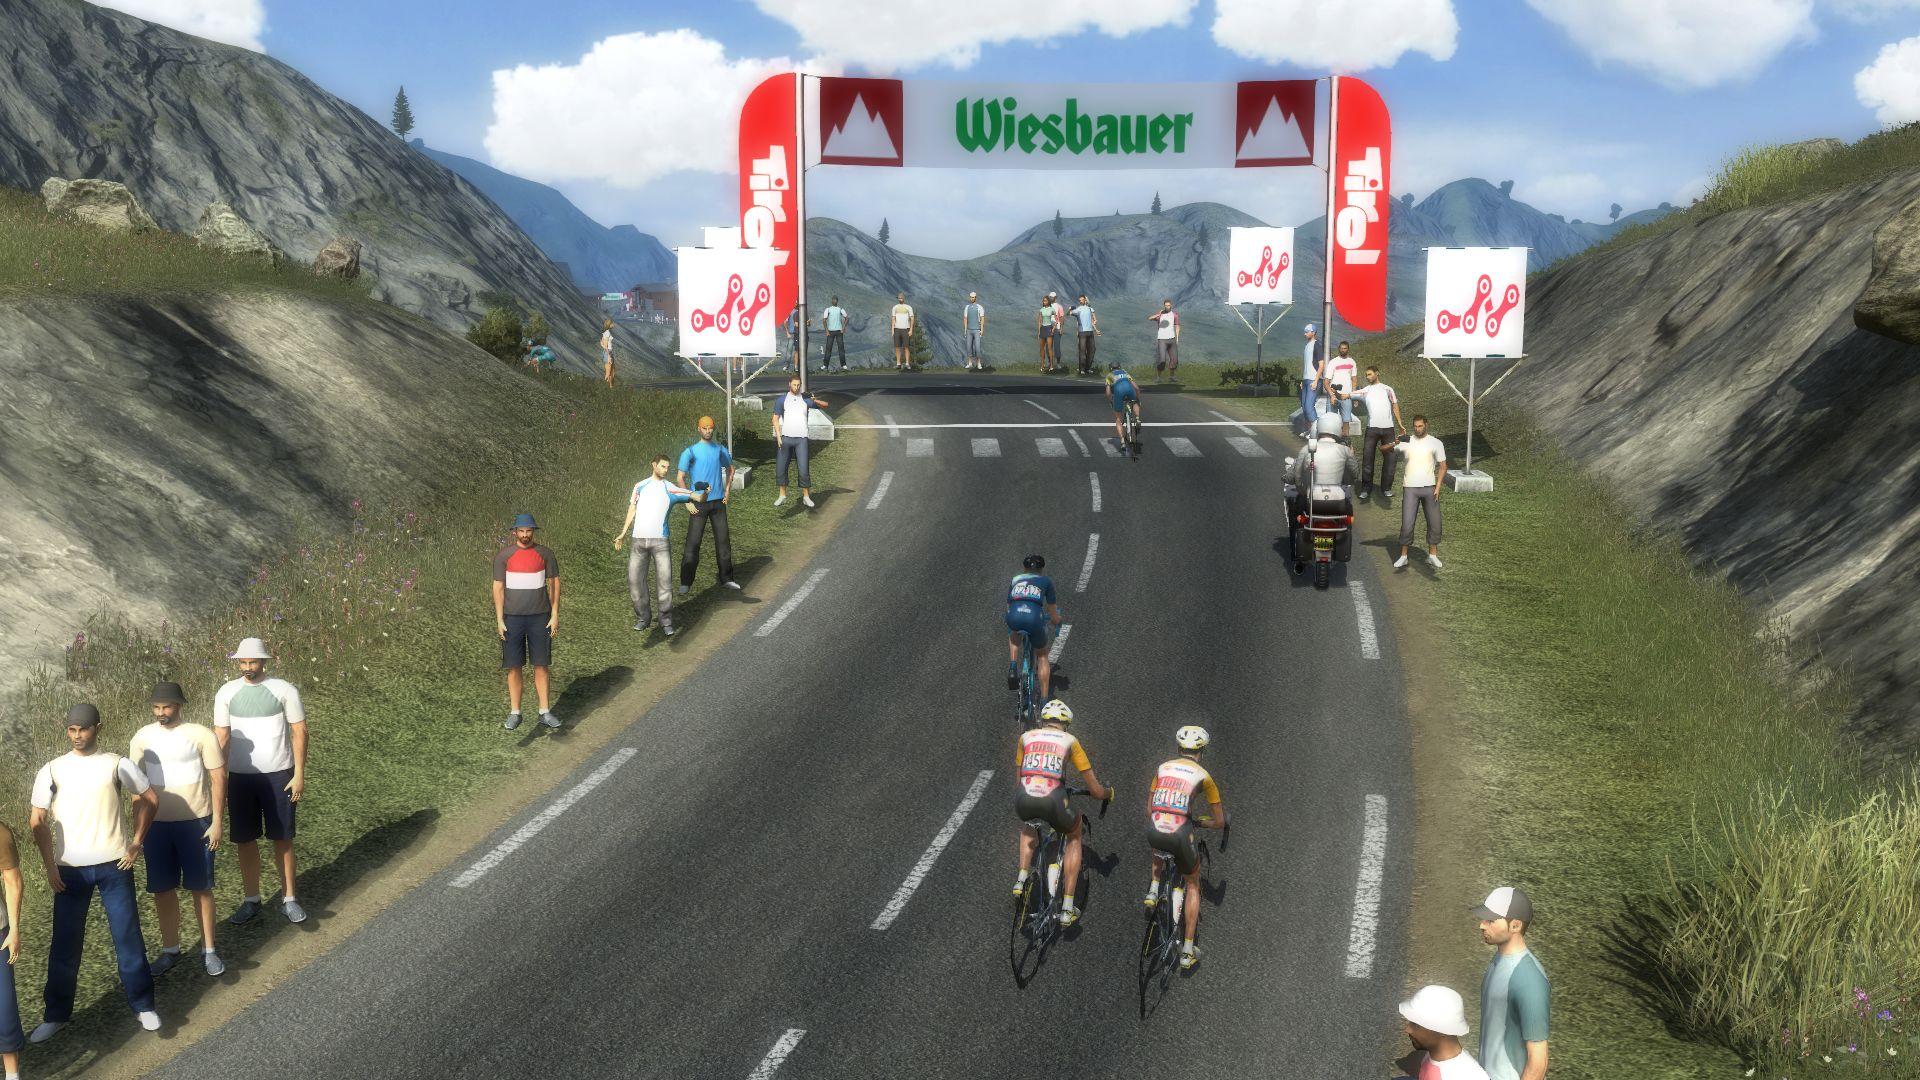 pcmdaily.com/images/mg/2020/Reports/HC/Austria/S4/mg20_austria_s04_28.jpg